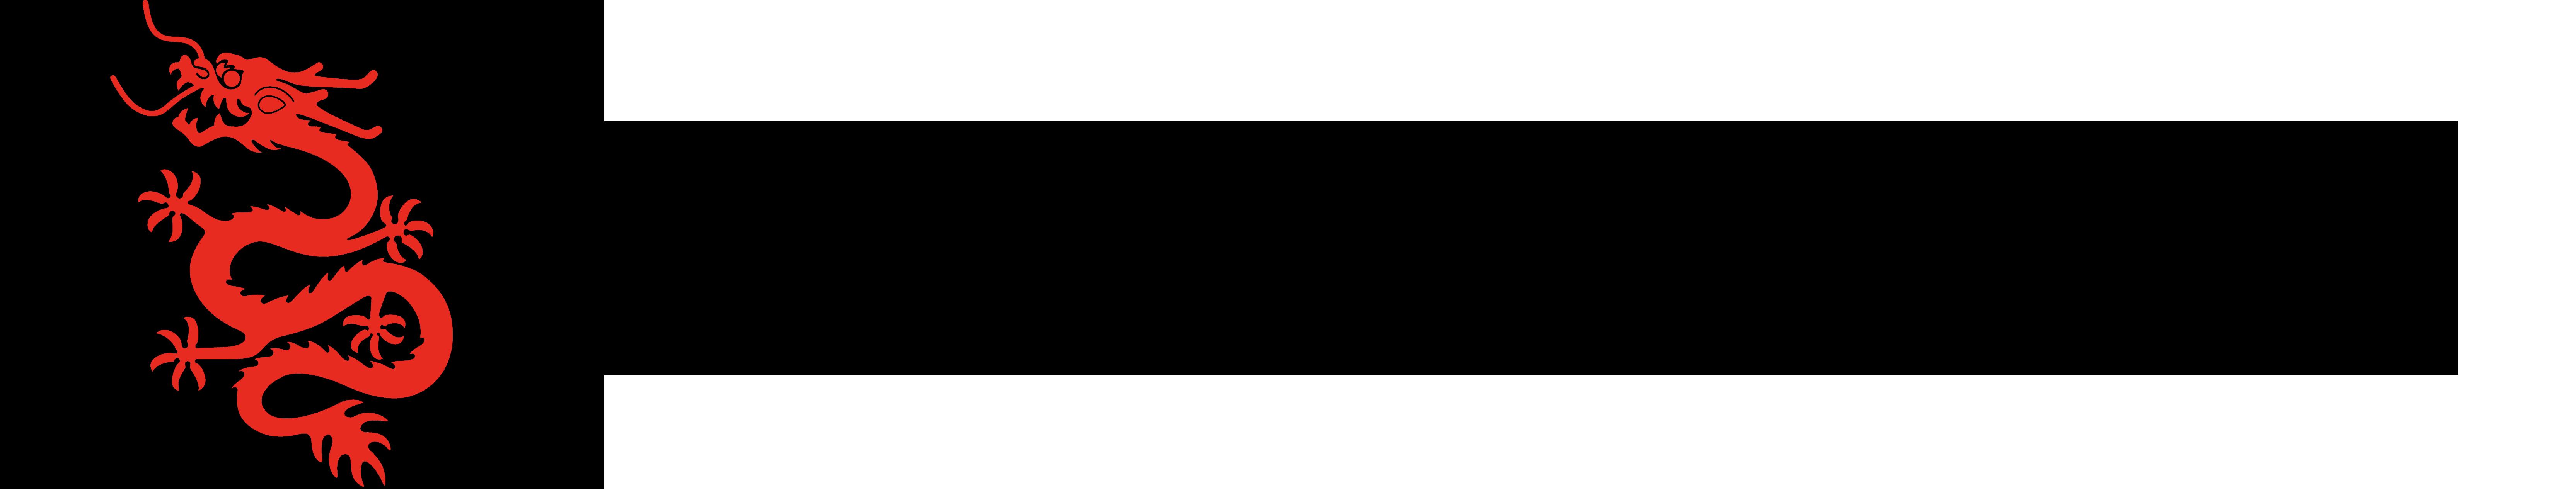 Dragonair Logo PNG - 101564